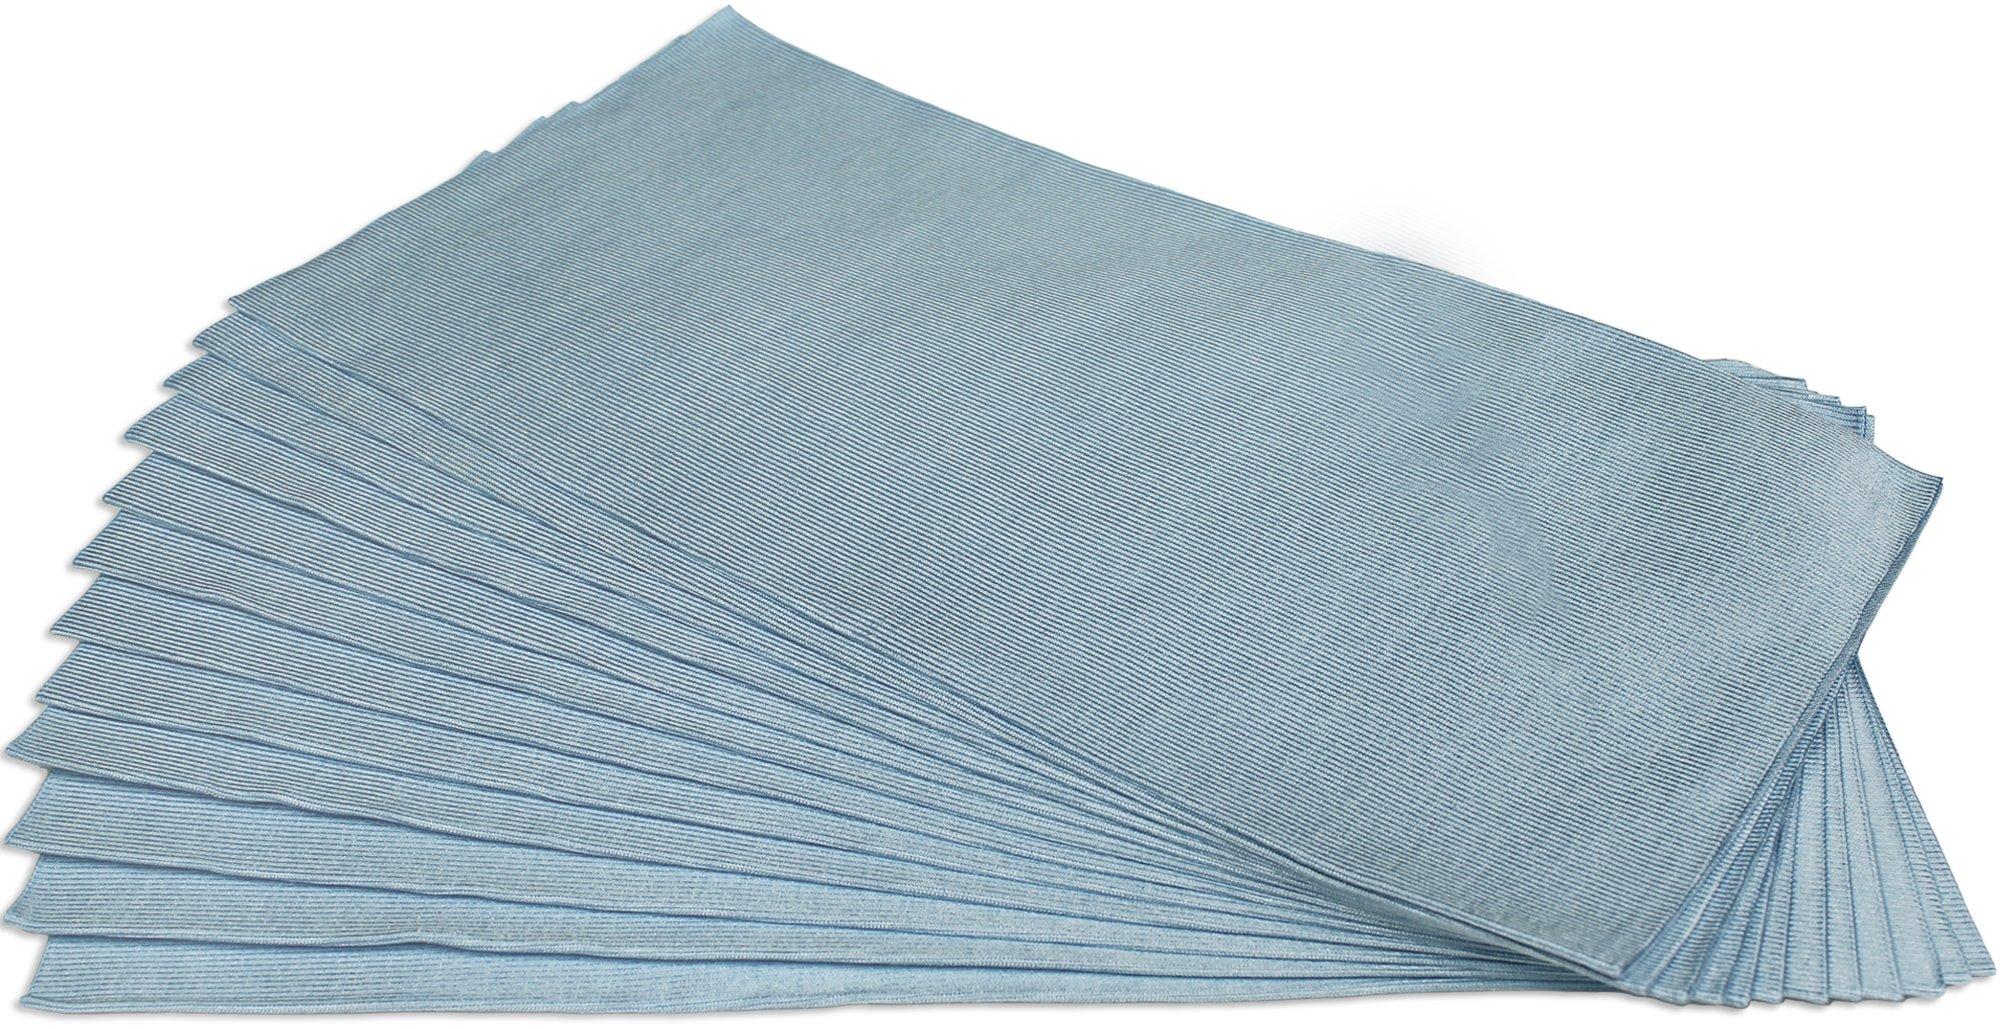 CleanAide Ultrasonic Cut Glass Weave Microfiber Towel 16 in X 16 in - 12 Pack